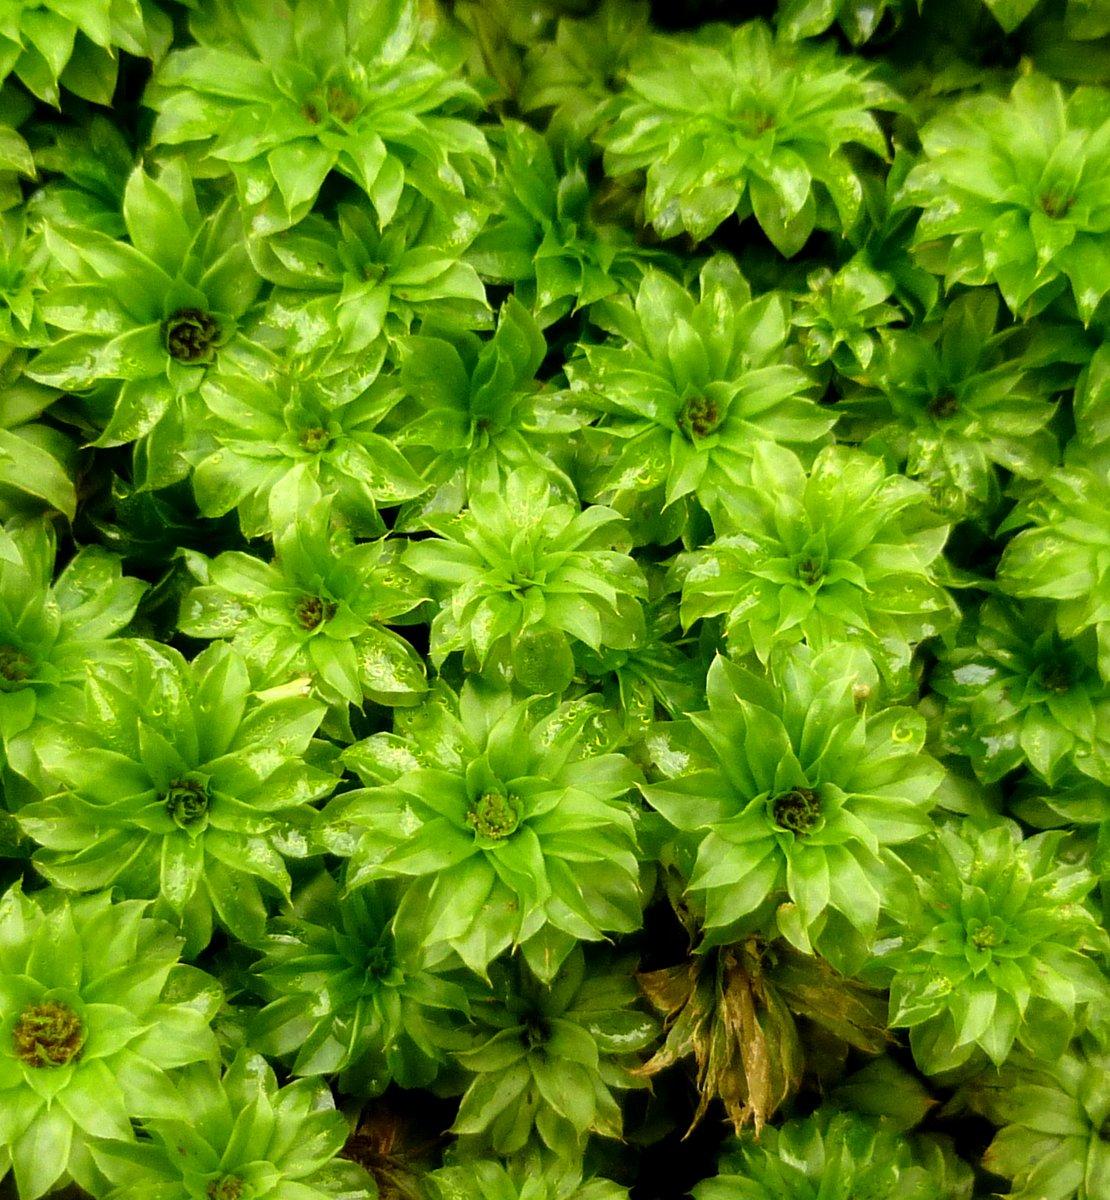 2. Rose Moss aka Rhodobryum roseum